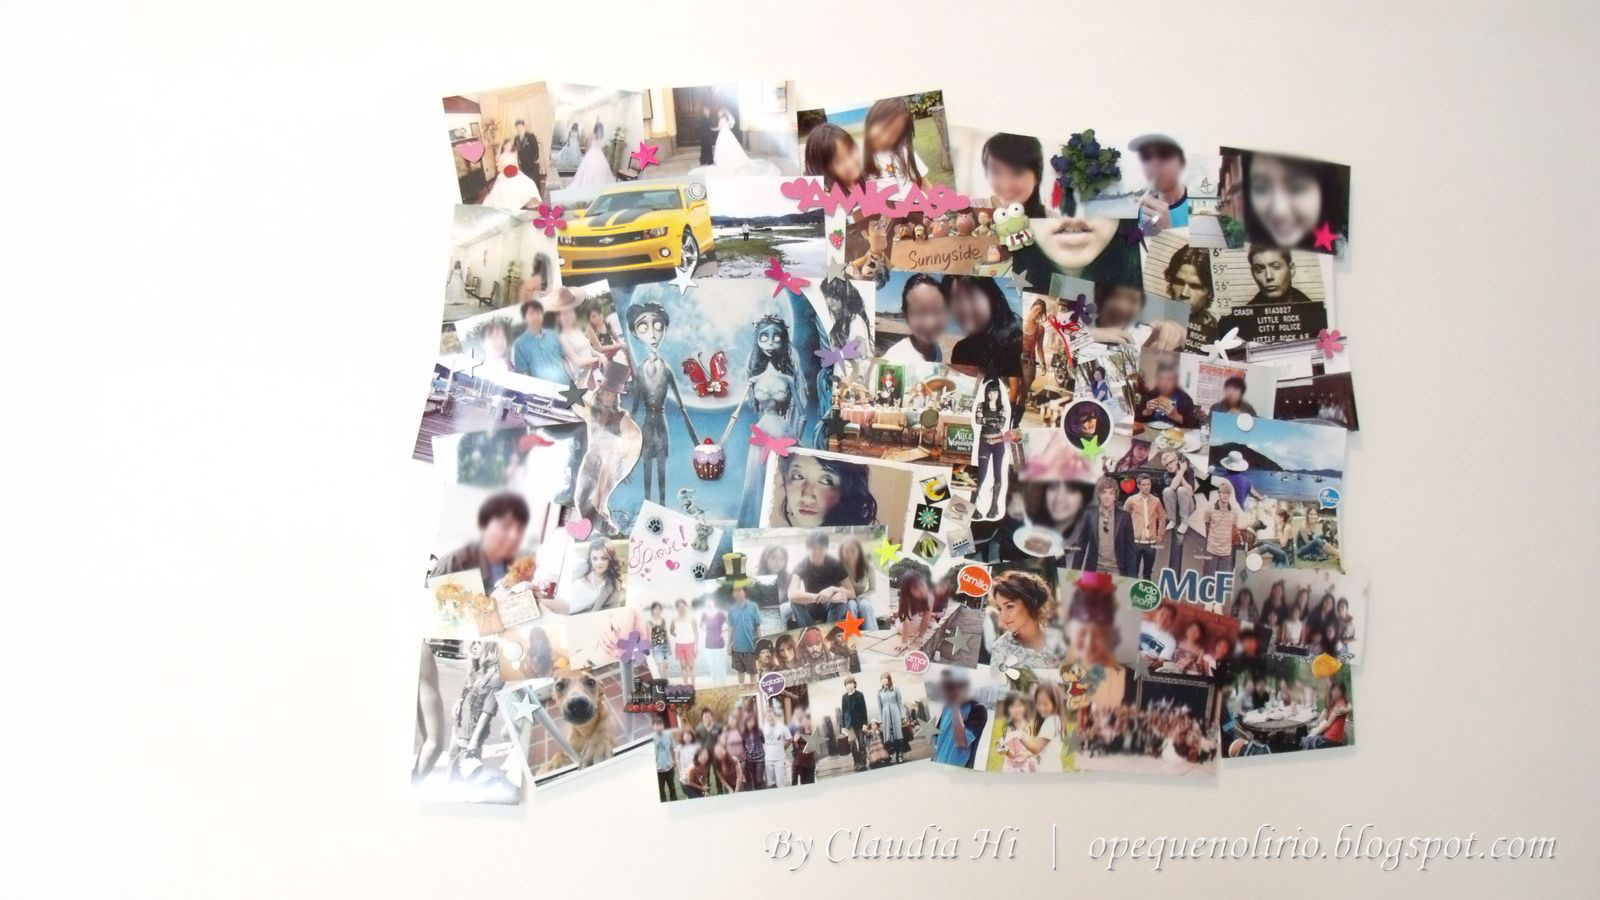 mural de menina, board, fotos, imãs